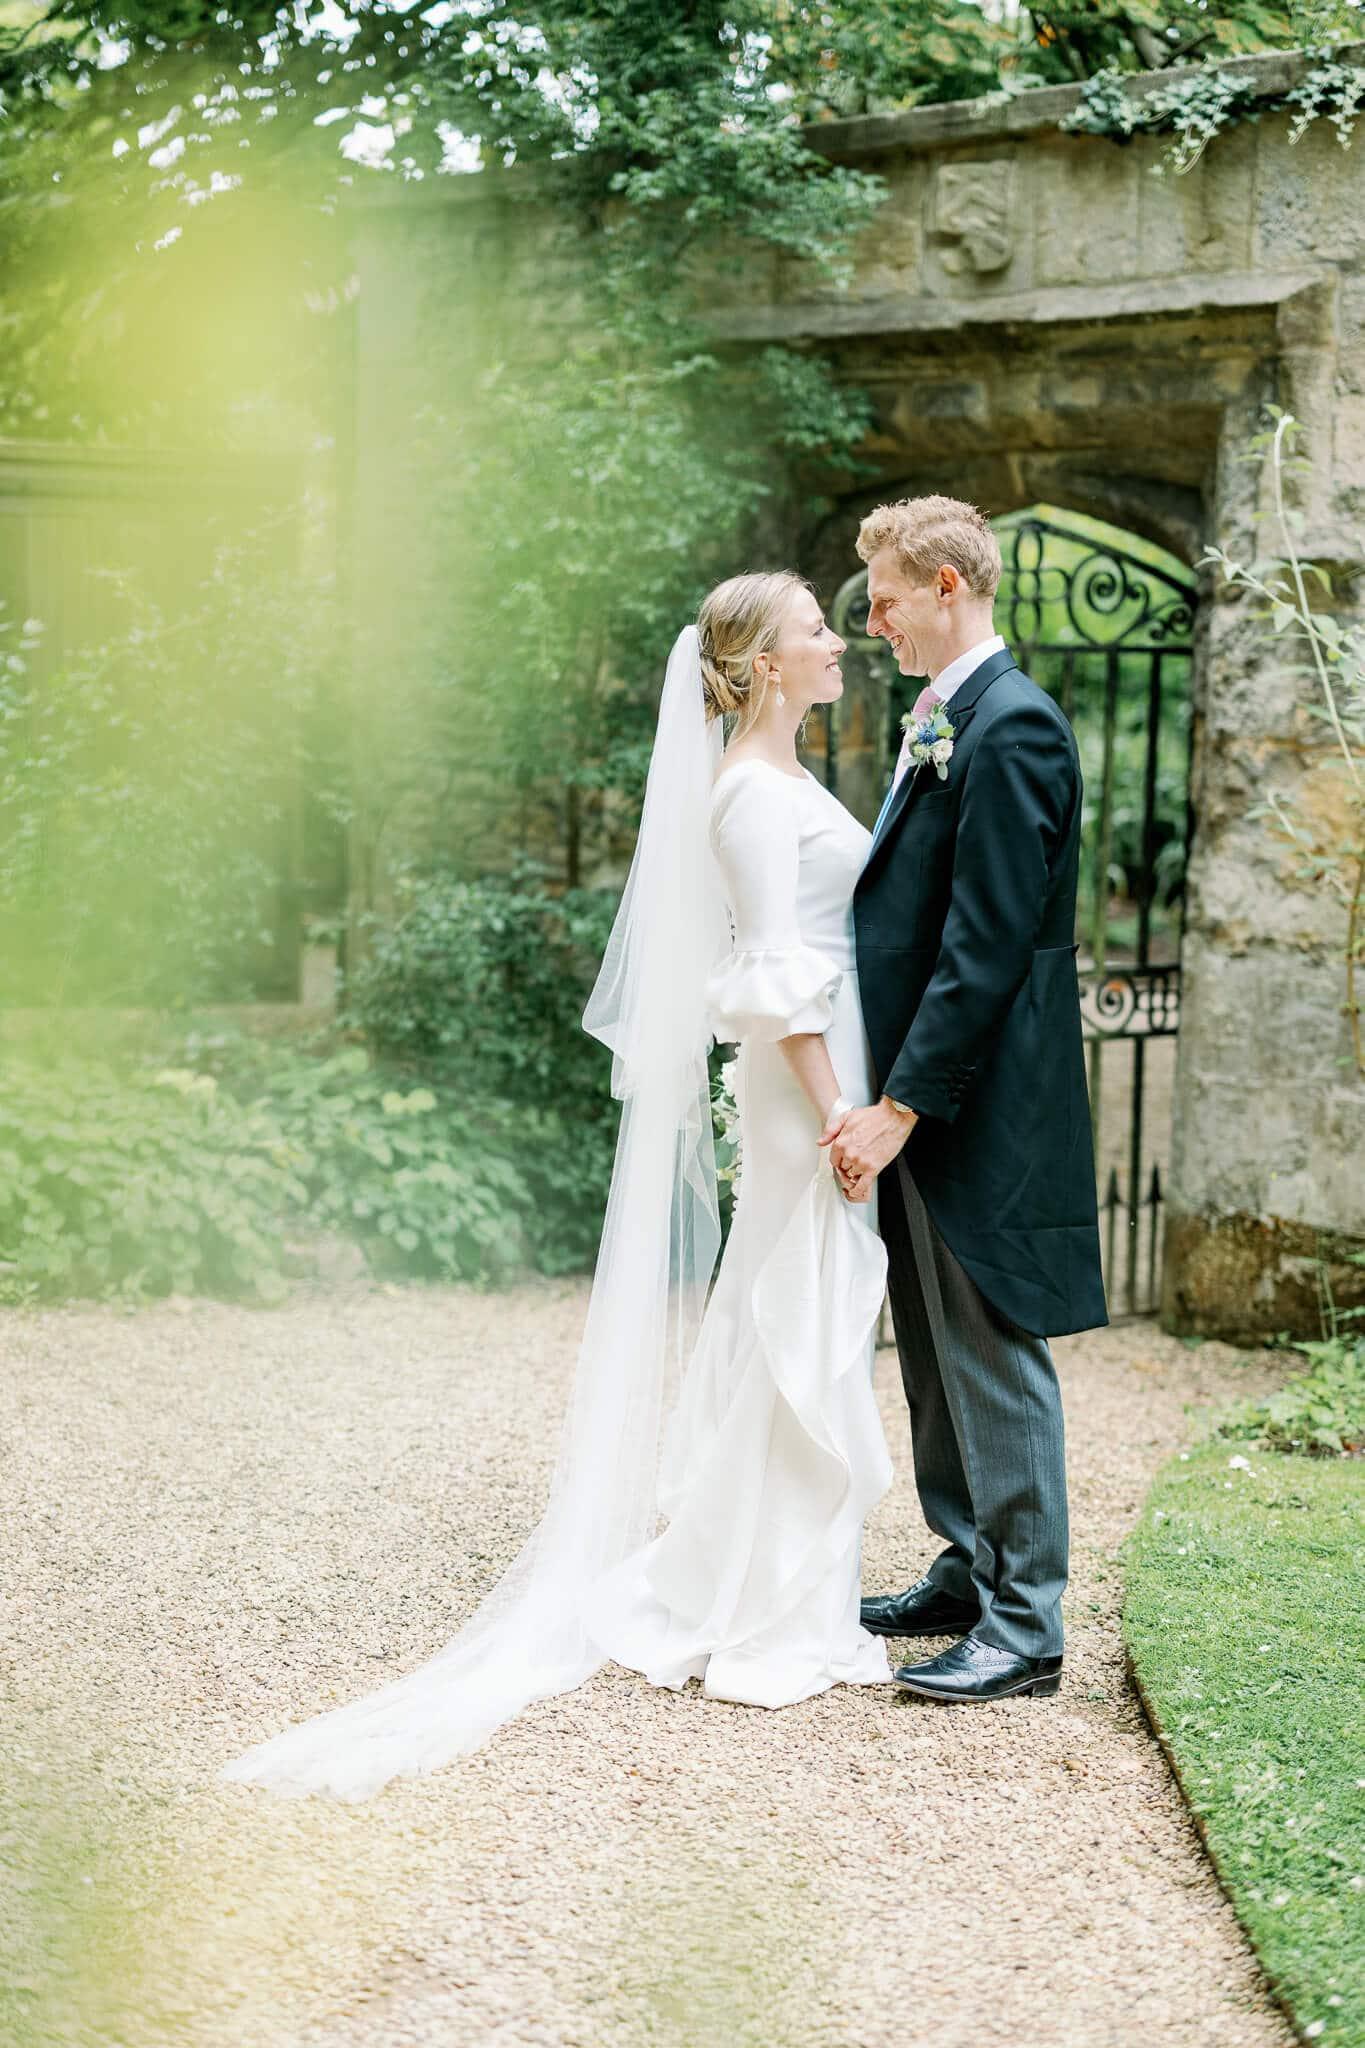 Worcester college wedding photos in Oxford